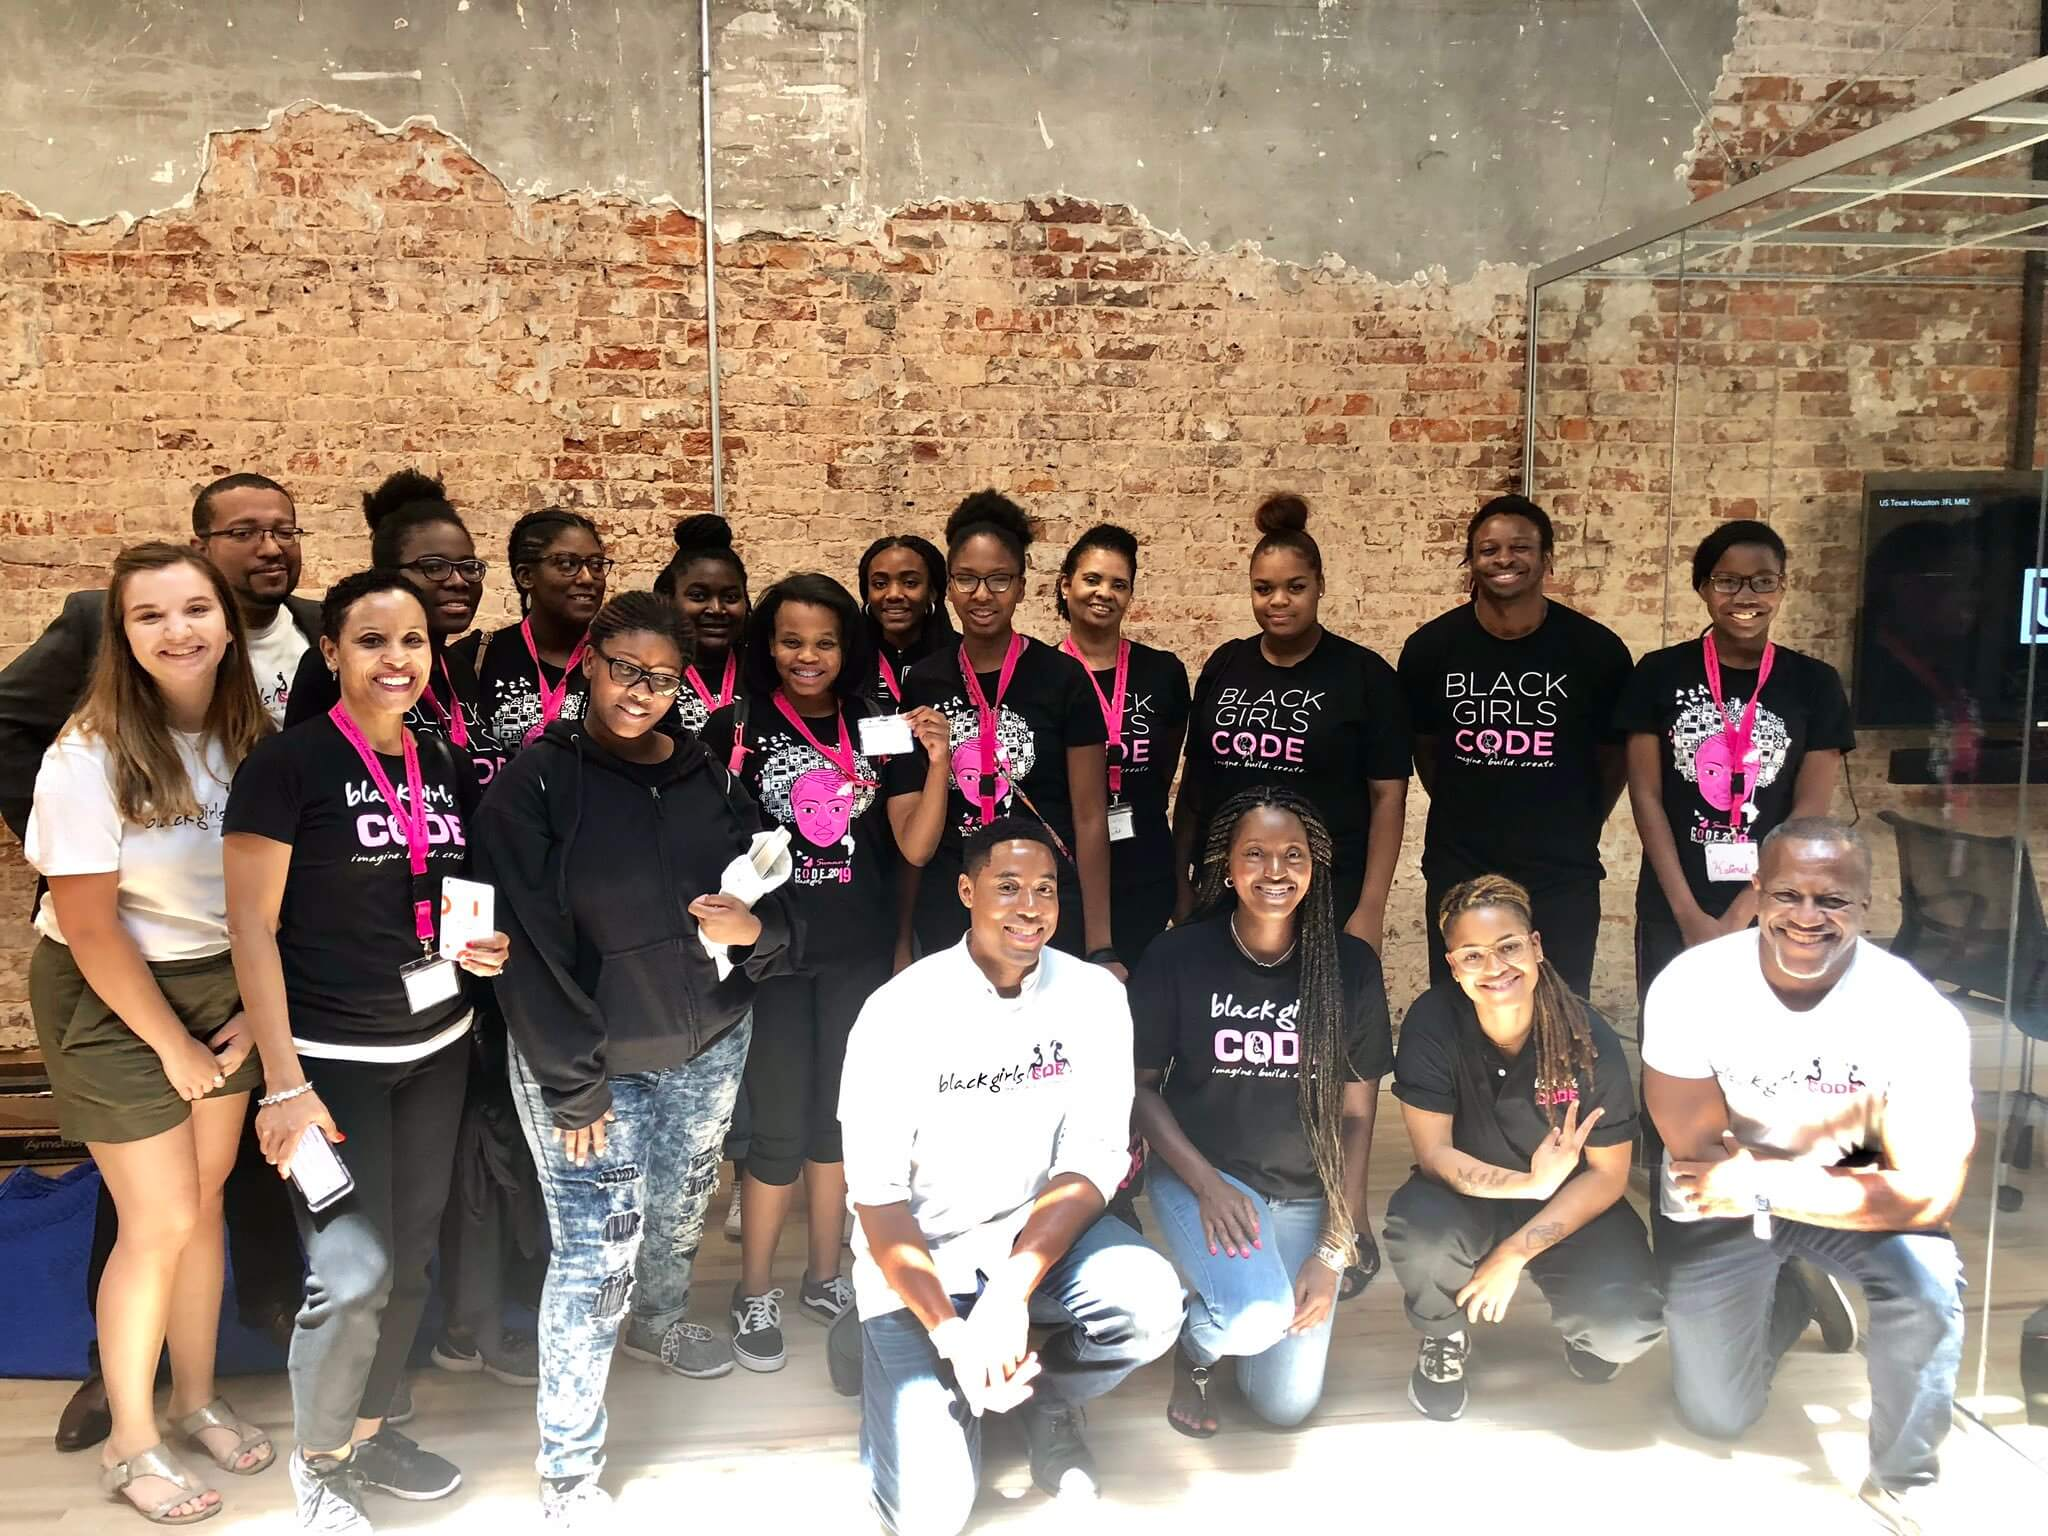 black-girls-code-visit-uipath-houston-office